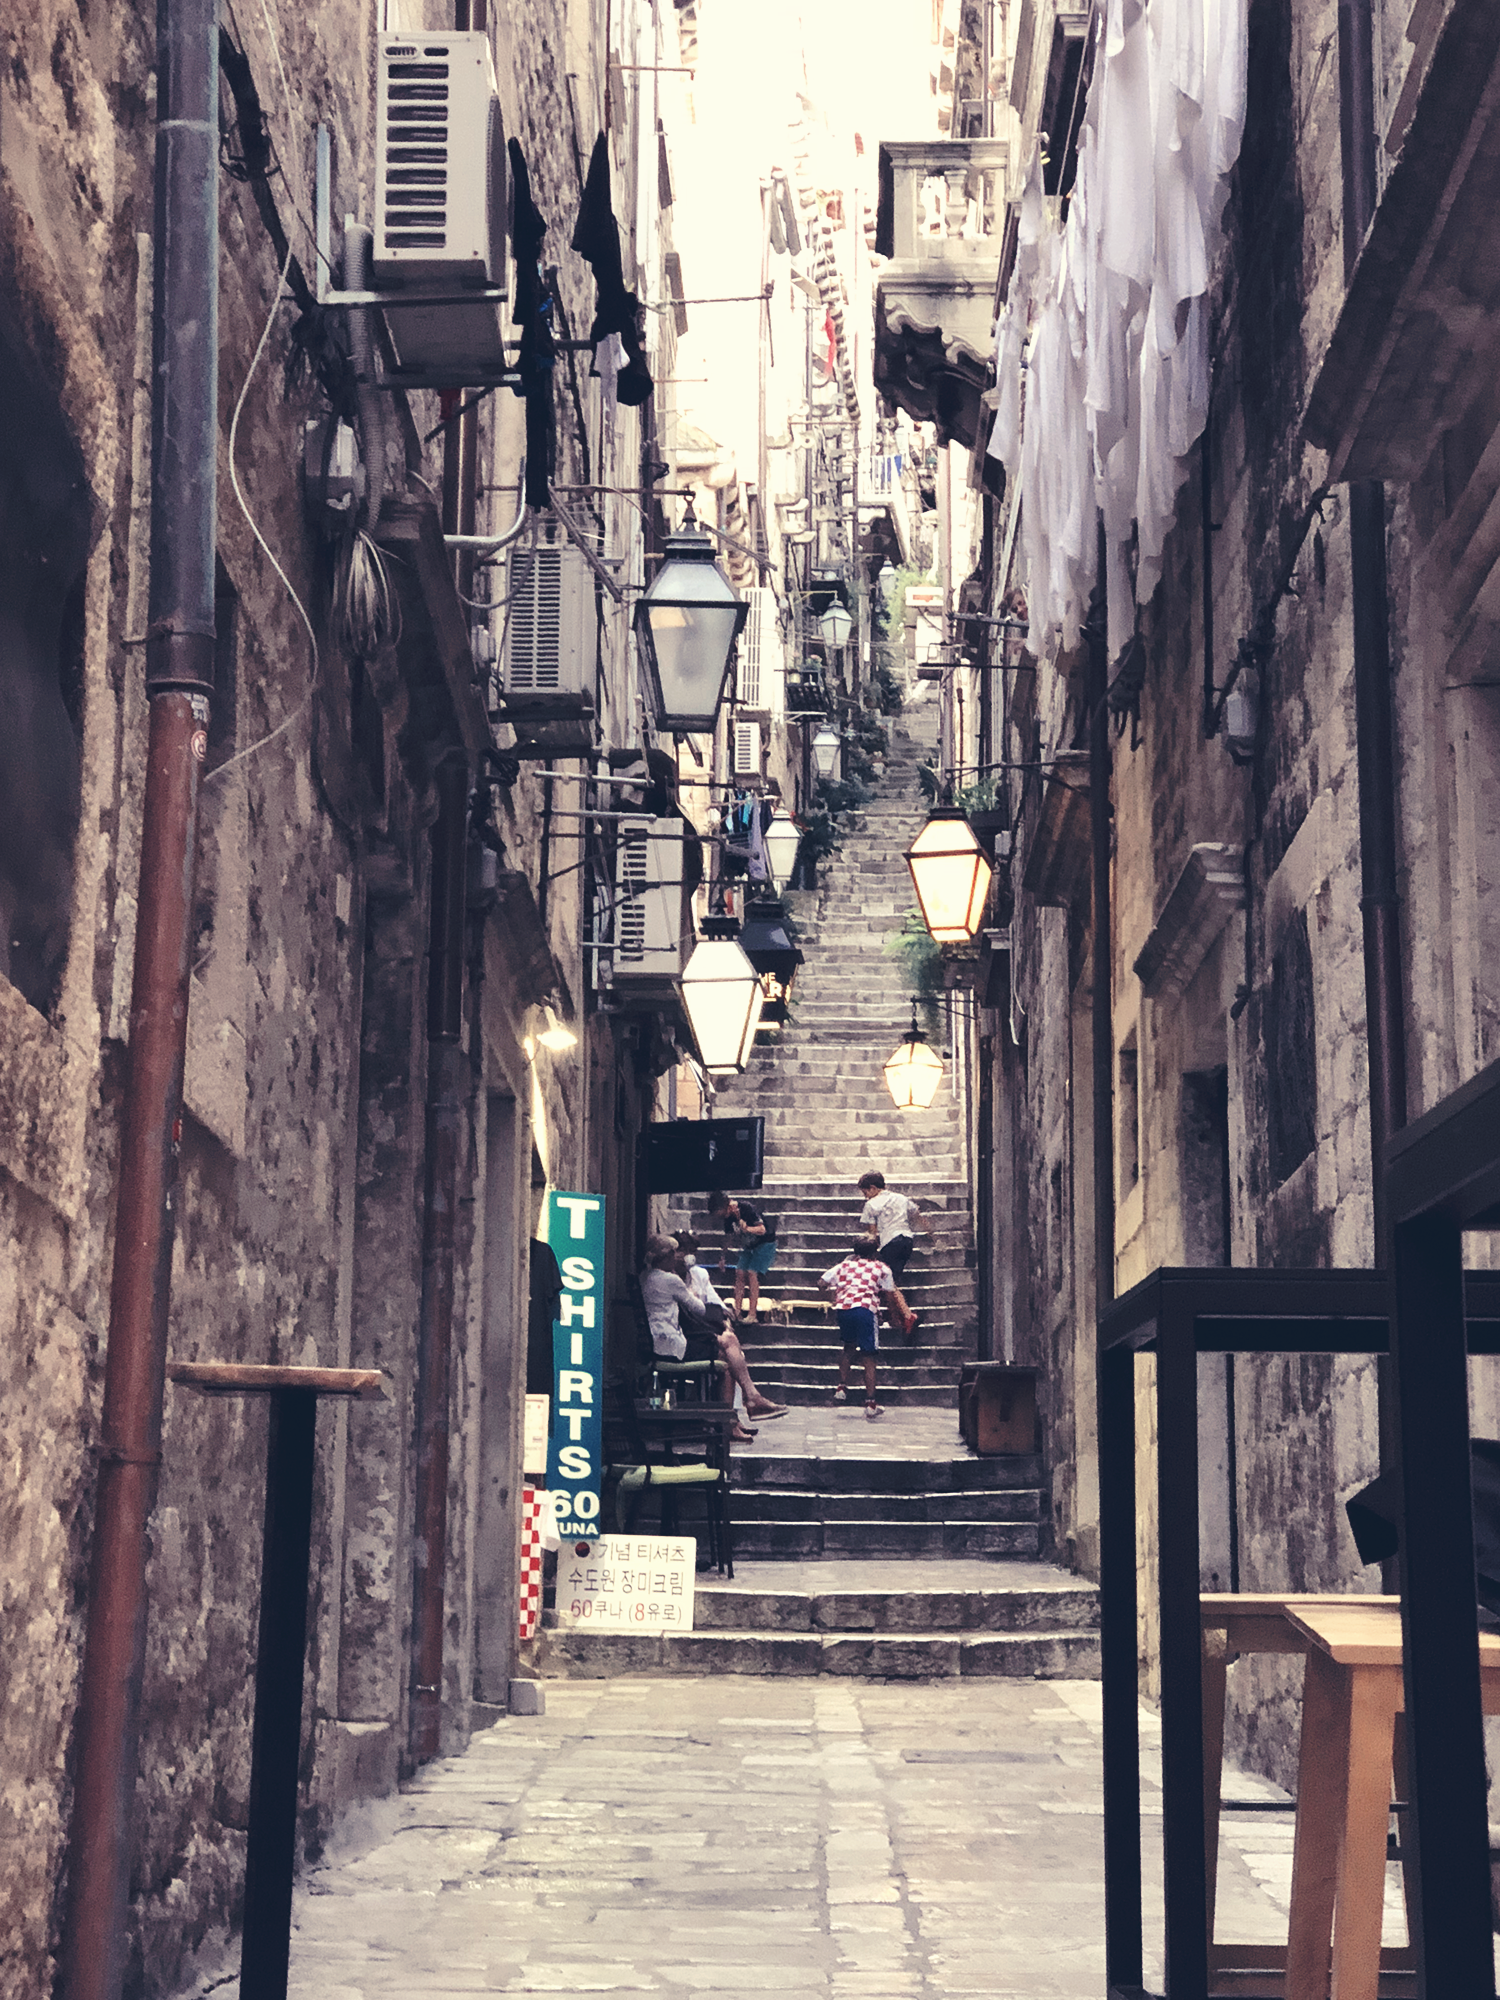 Dubrovnik Travel Guide | Sam Squire Travel Blogger